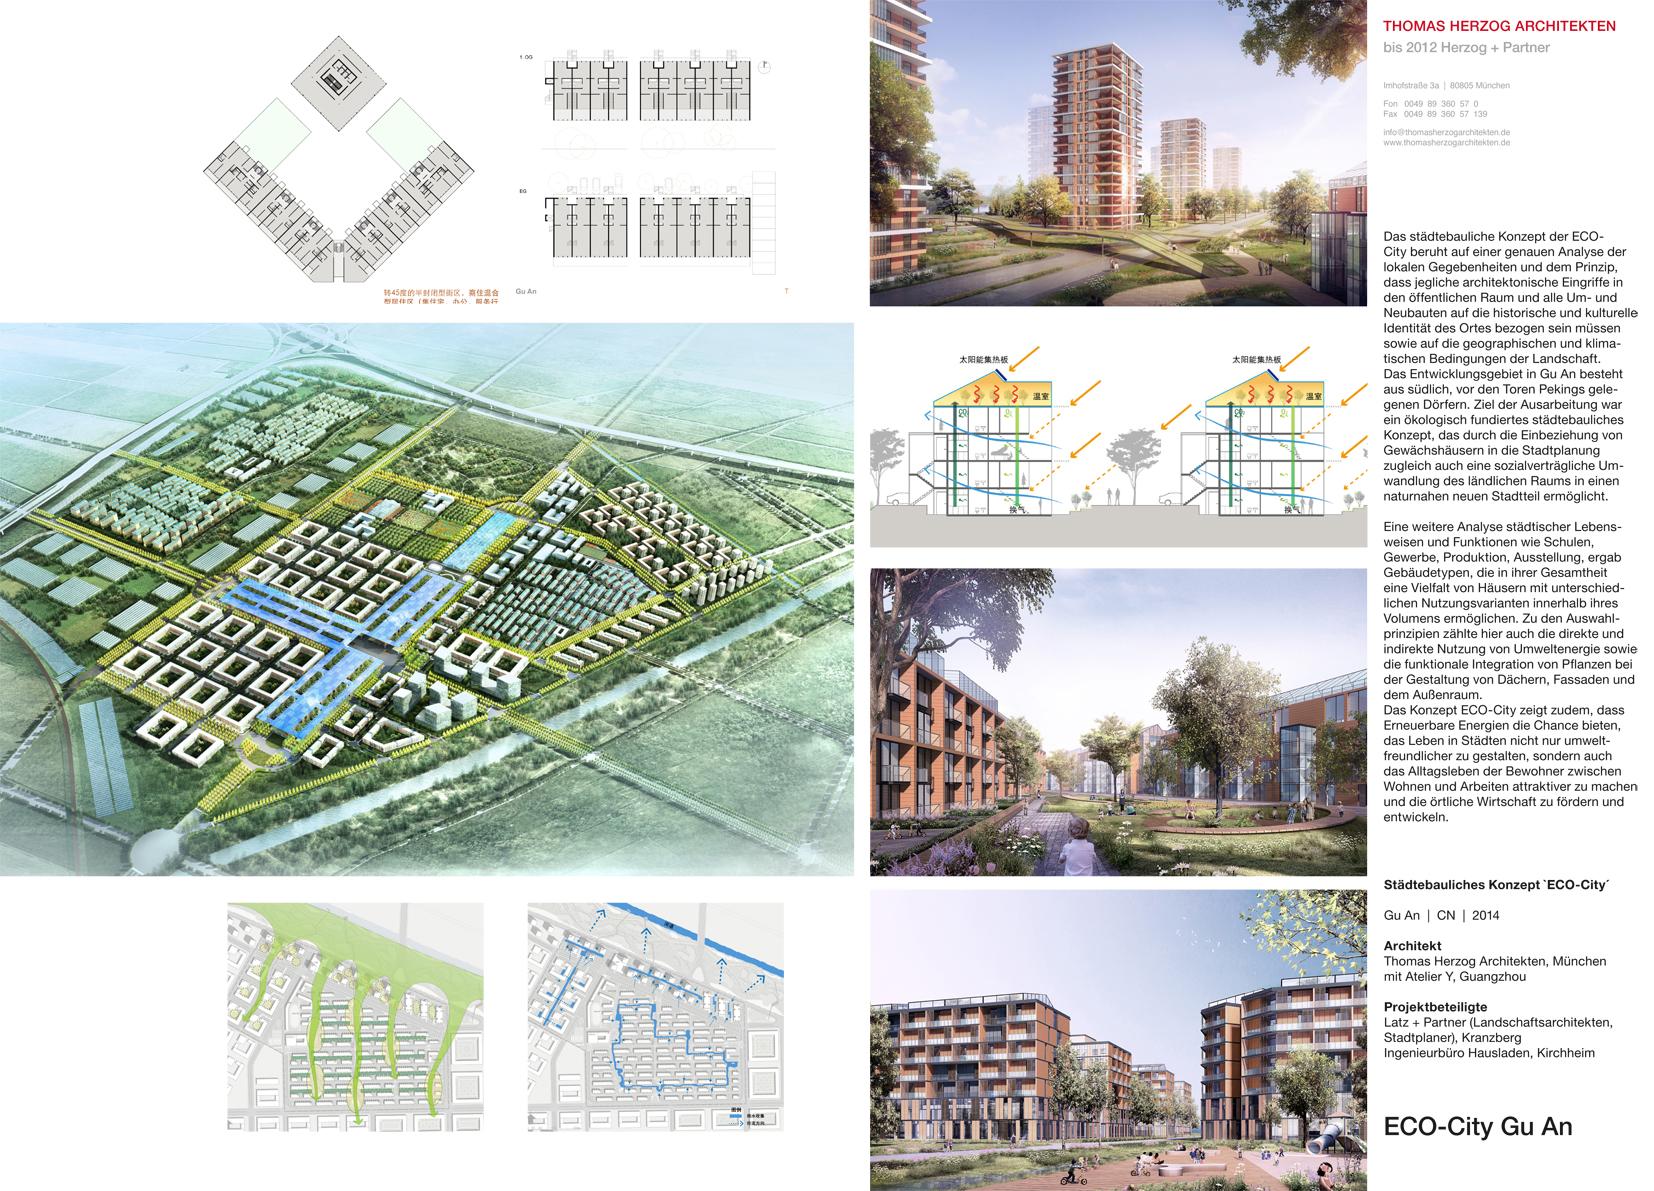 Eco-City Gu An CN 2014